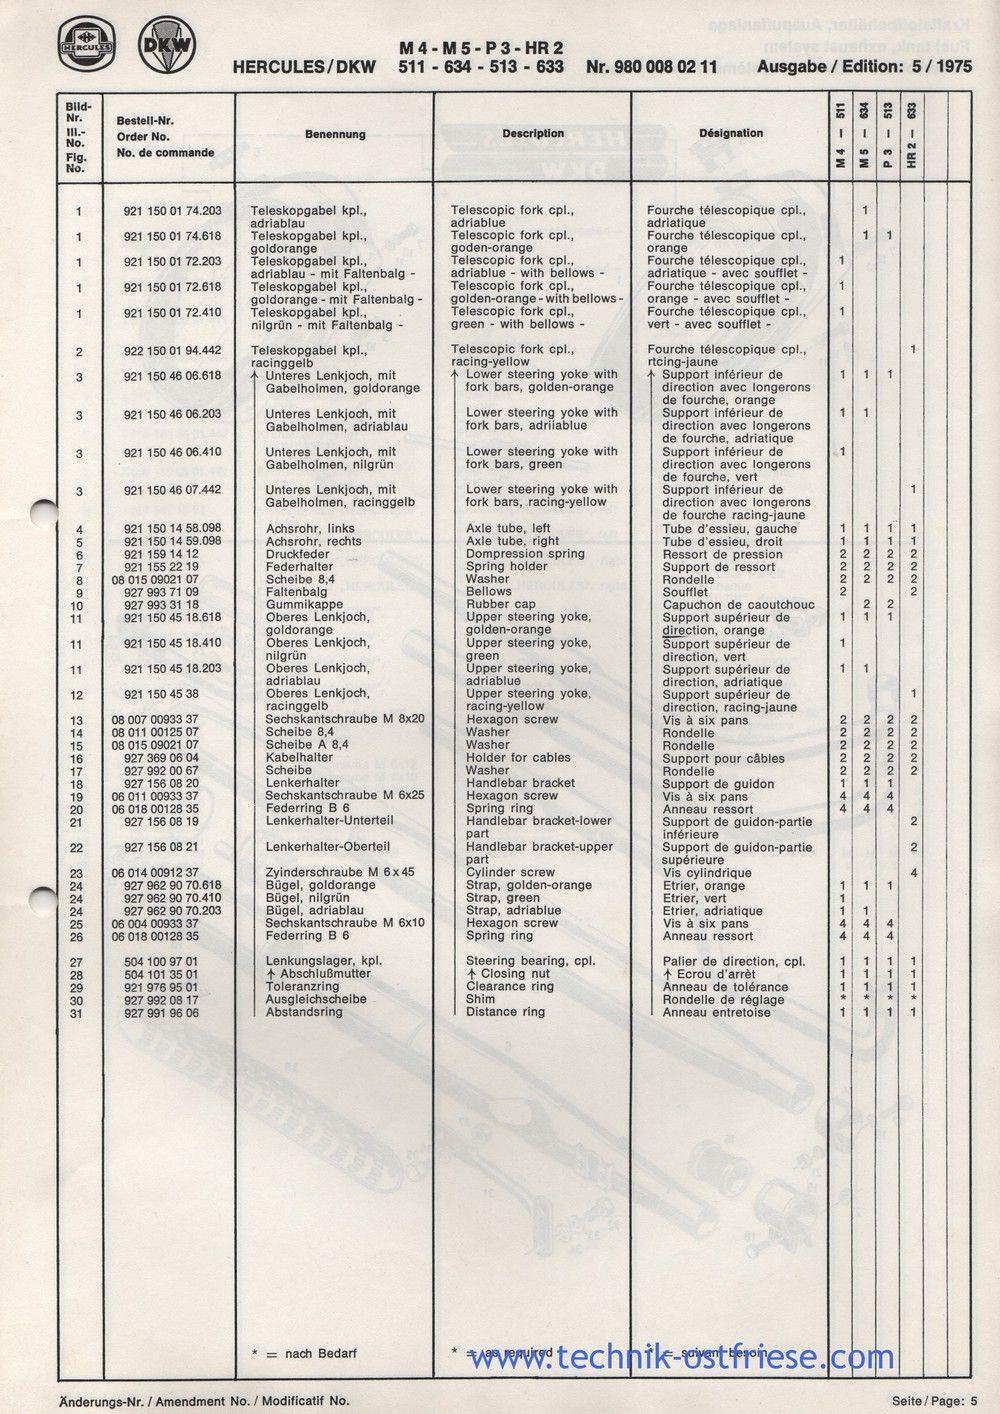 Hercules Dkw M4 511 M5 634 P3 513 Hr2 633 Ersatzteile Liste